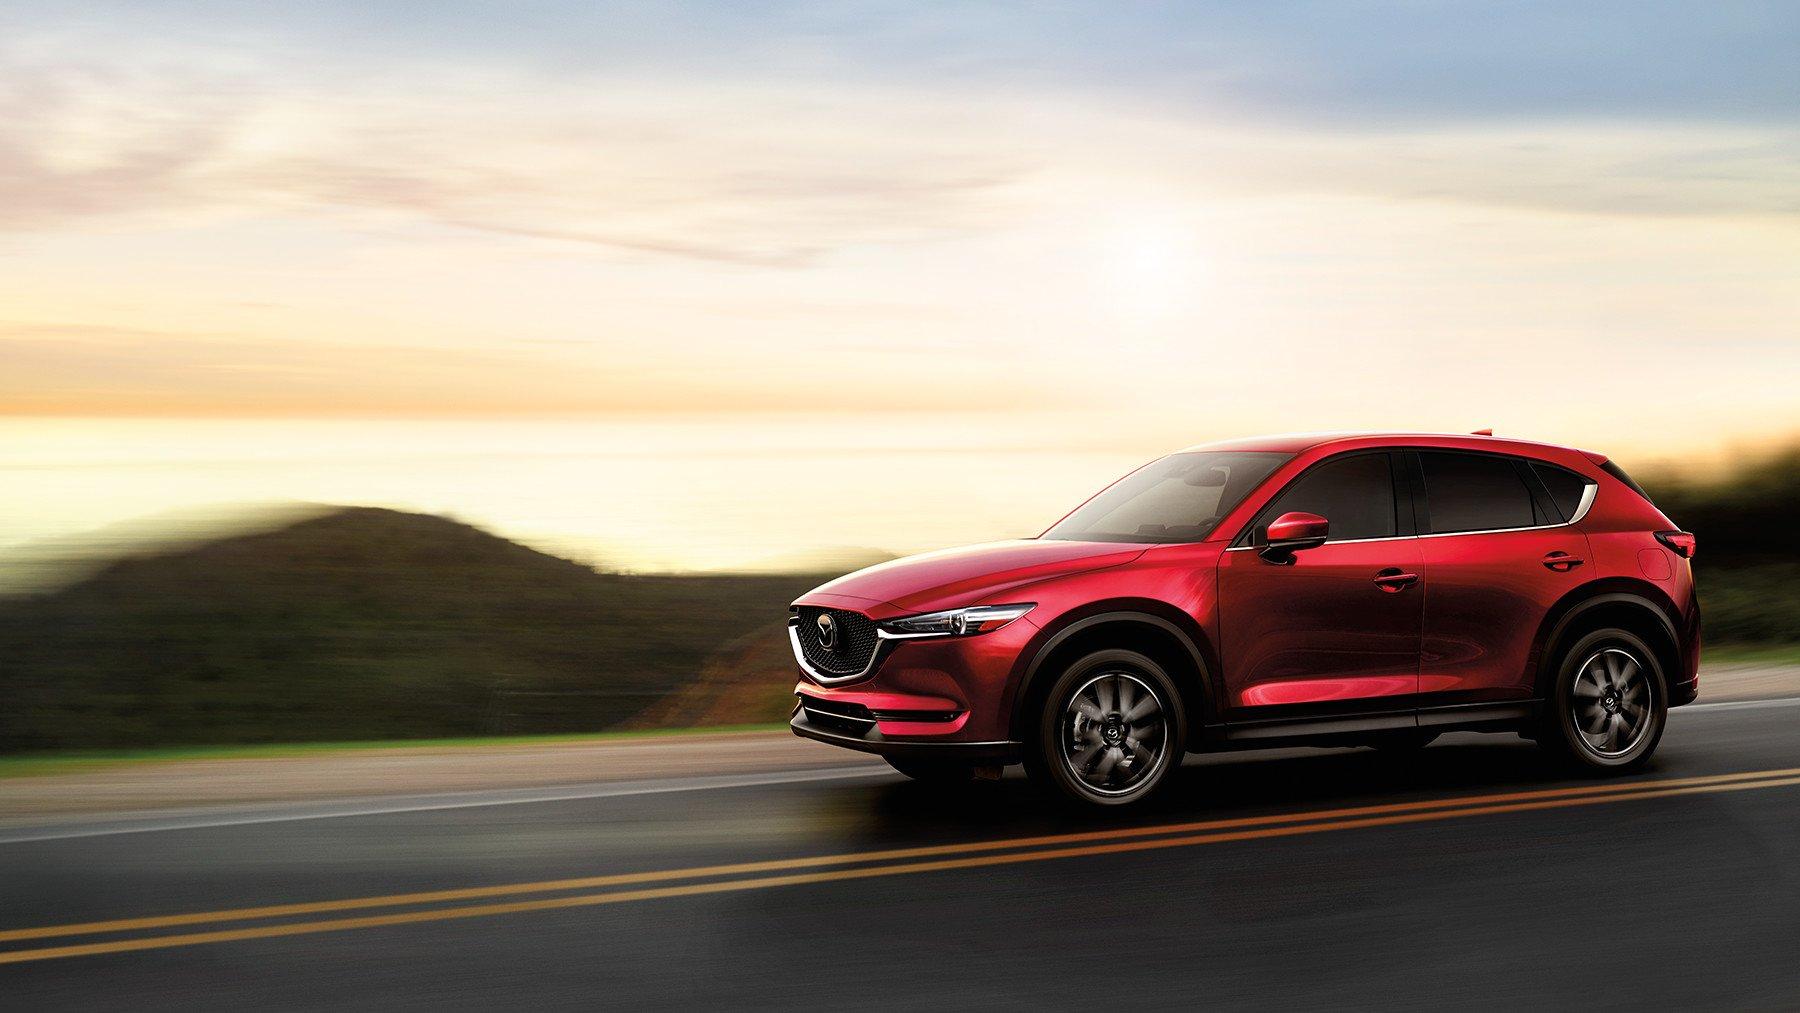 New Mazda CX 5 Exterior Features